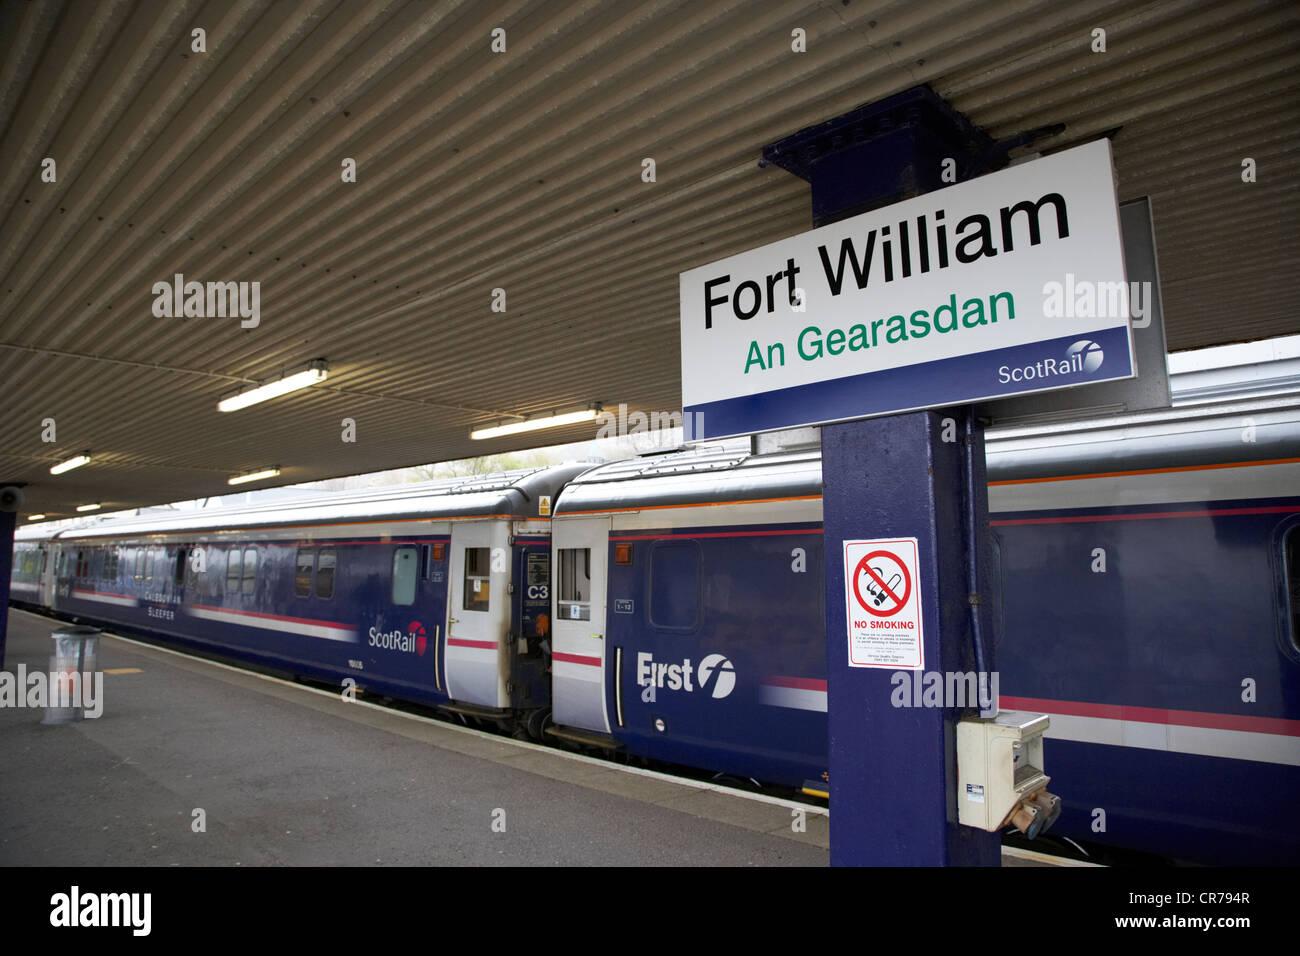 Fort William Train Station Stock Photos Amp Fort William